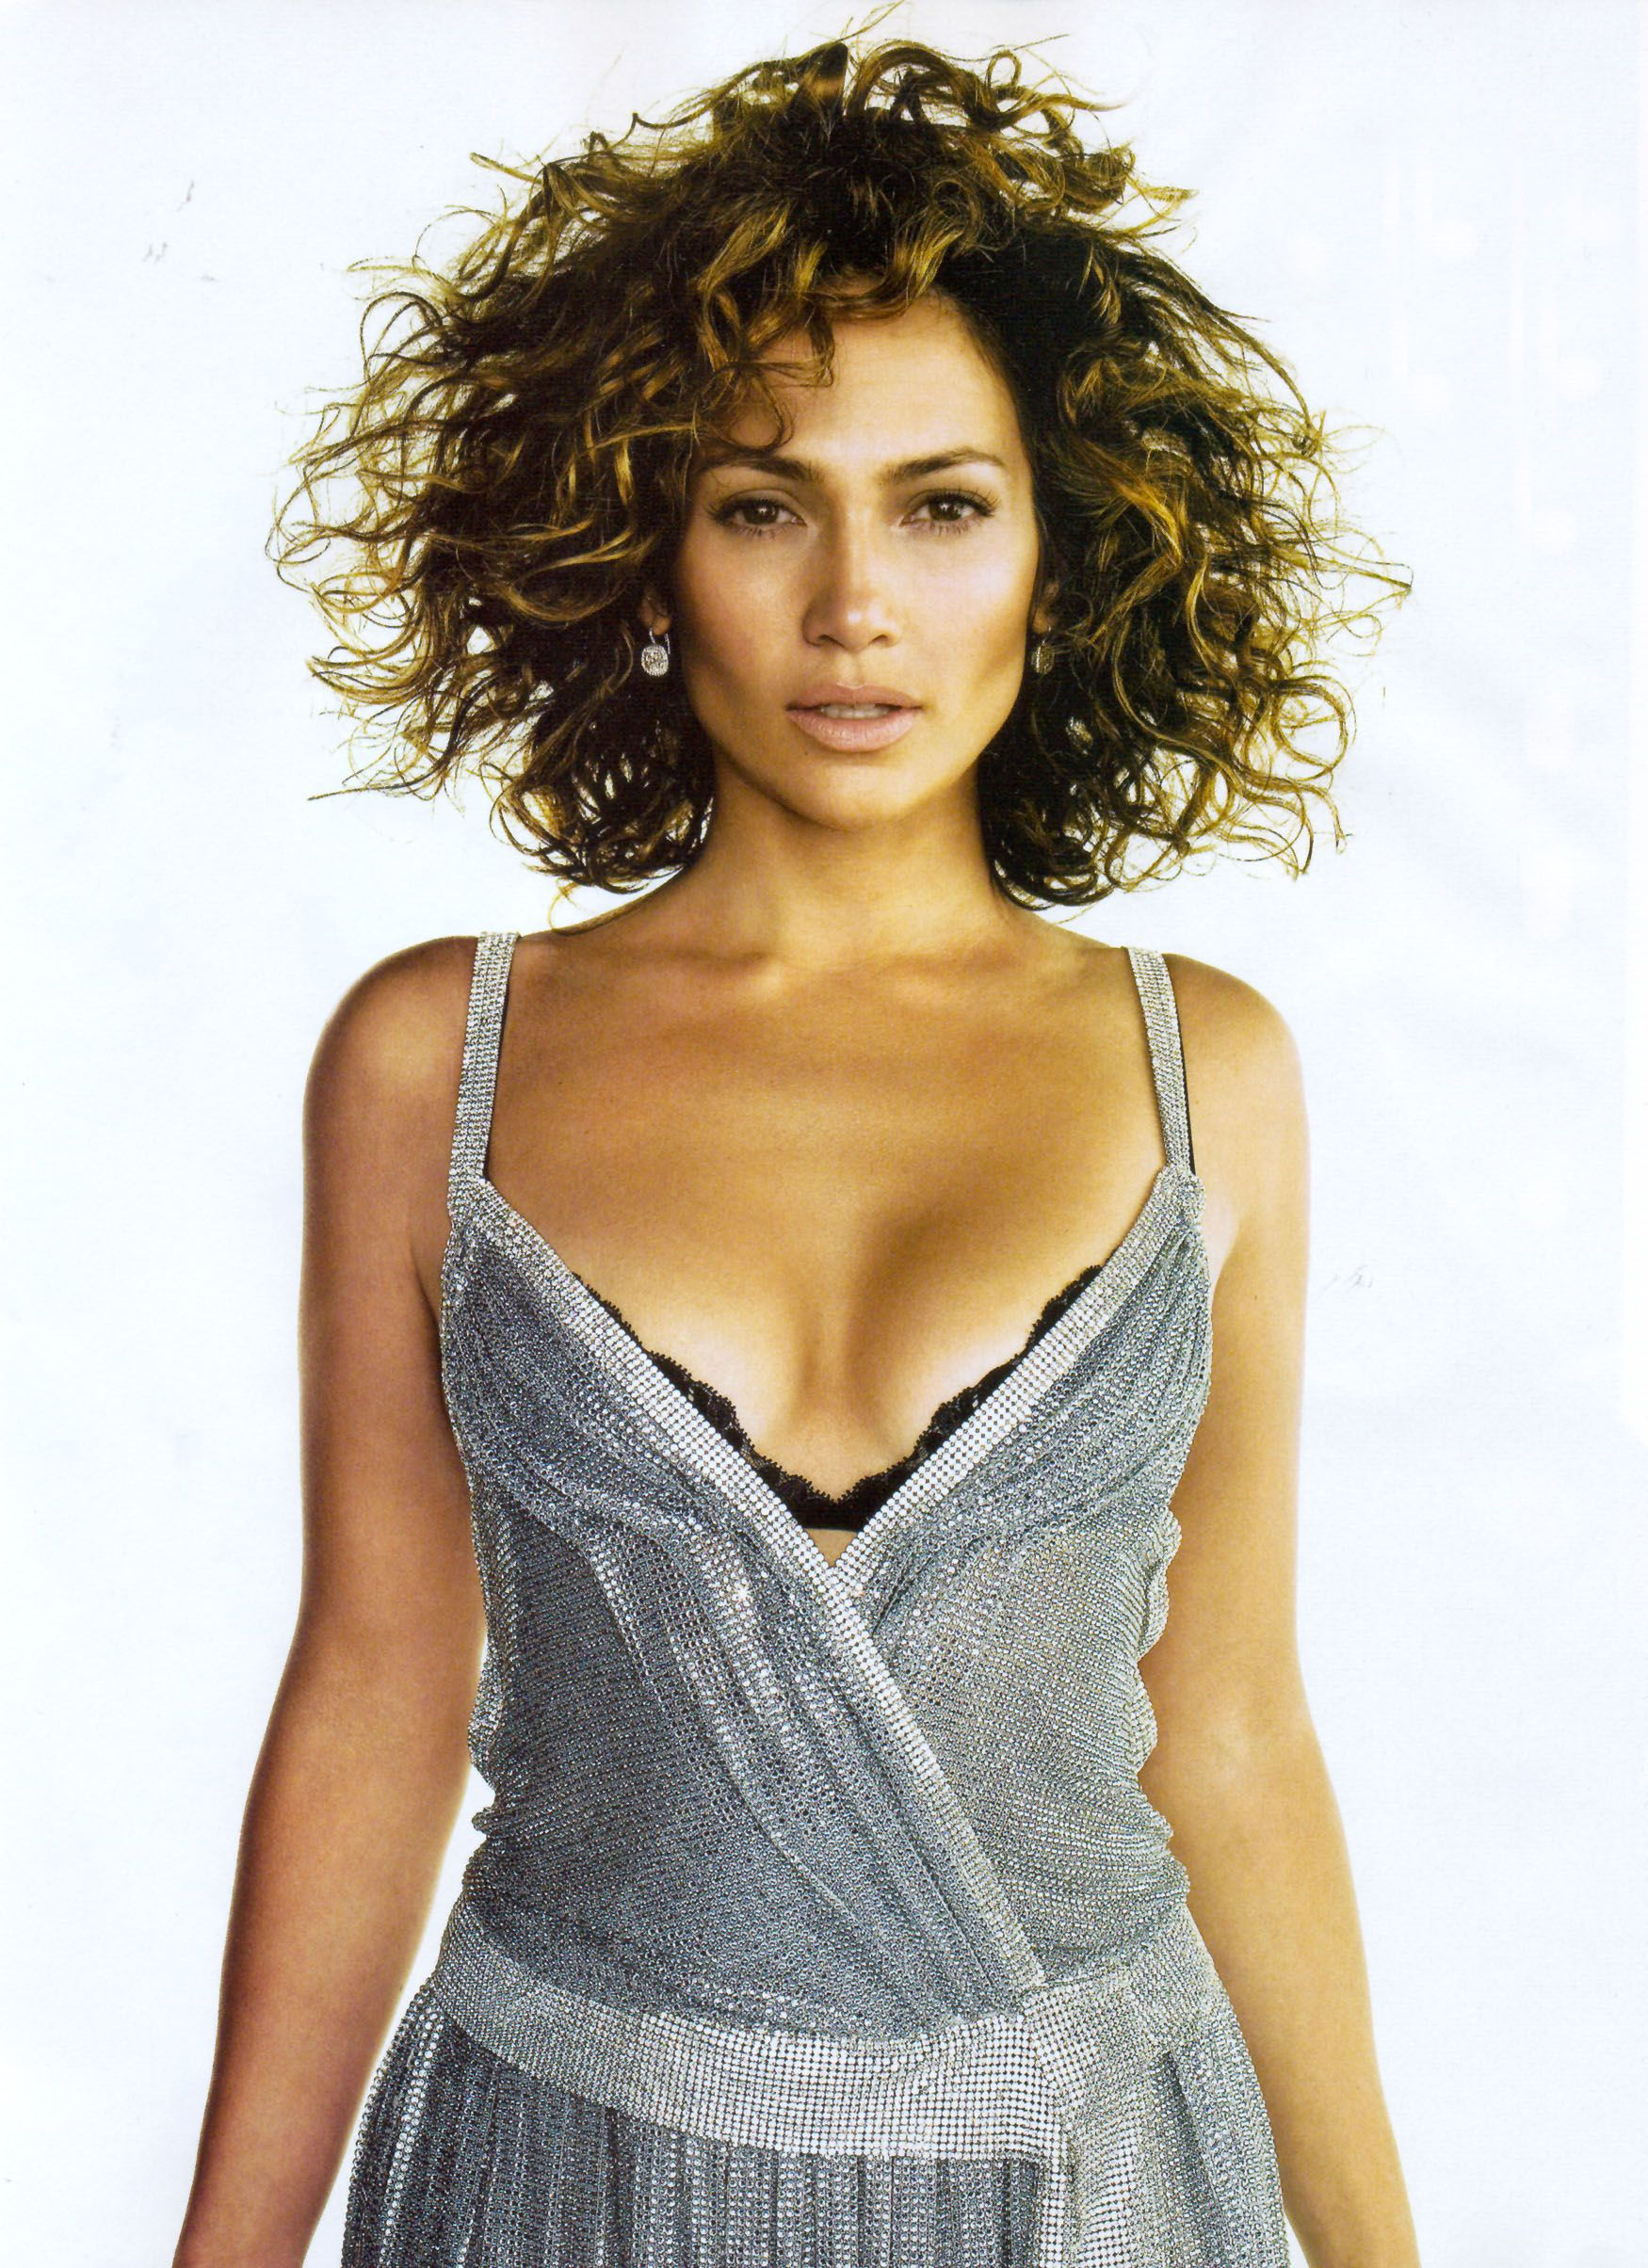 b777dd4ba8 sparkly dress jennifer lopez Imágenes De Jennifer Lopez